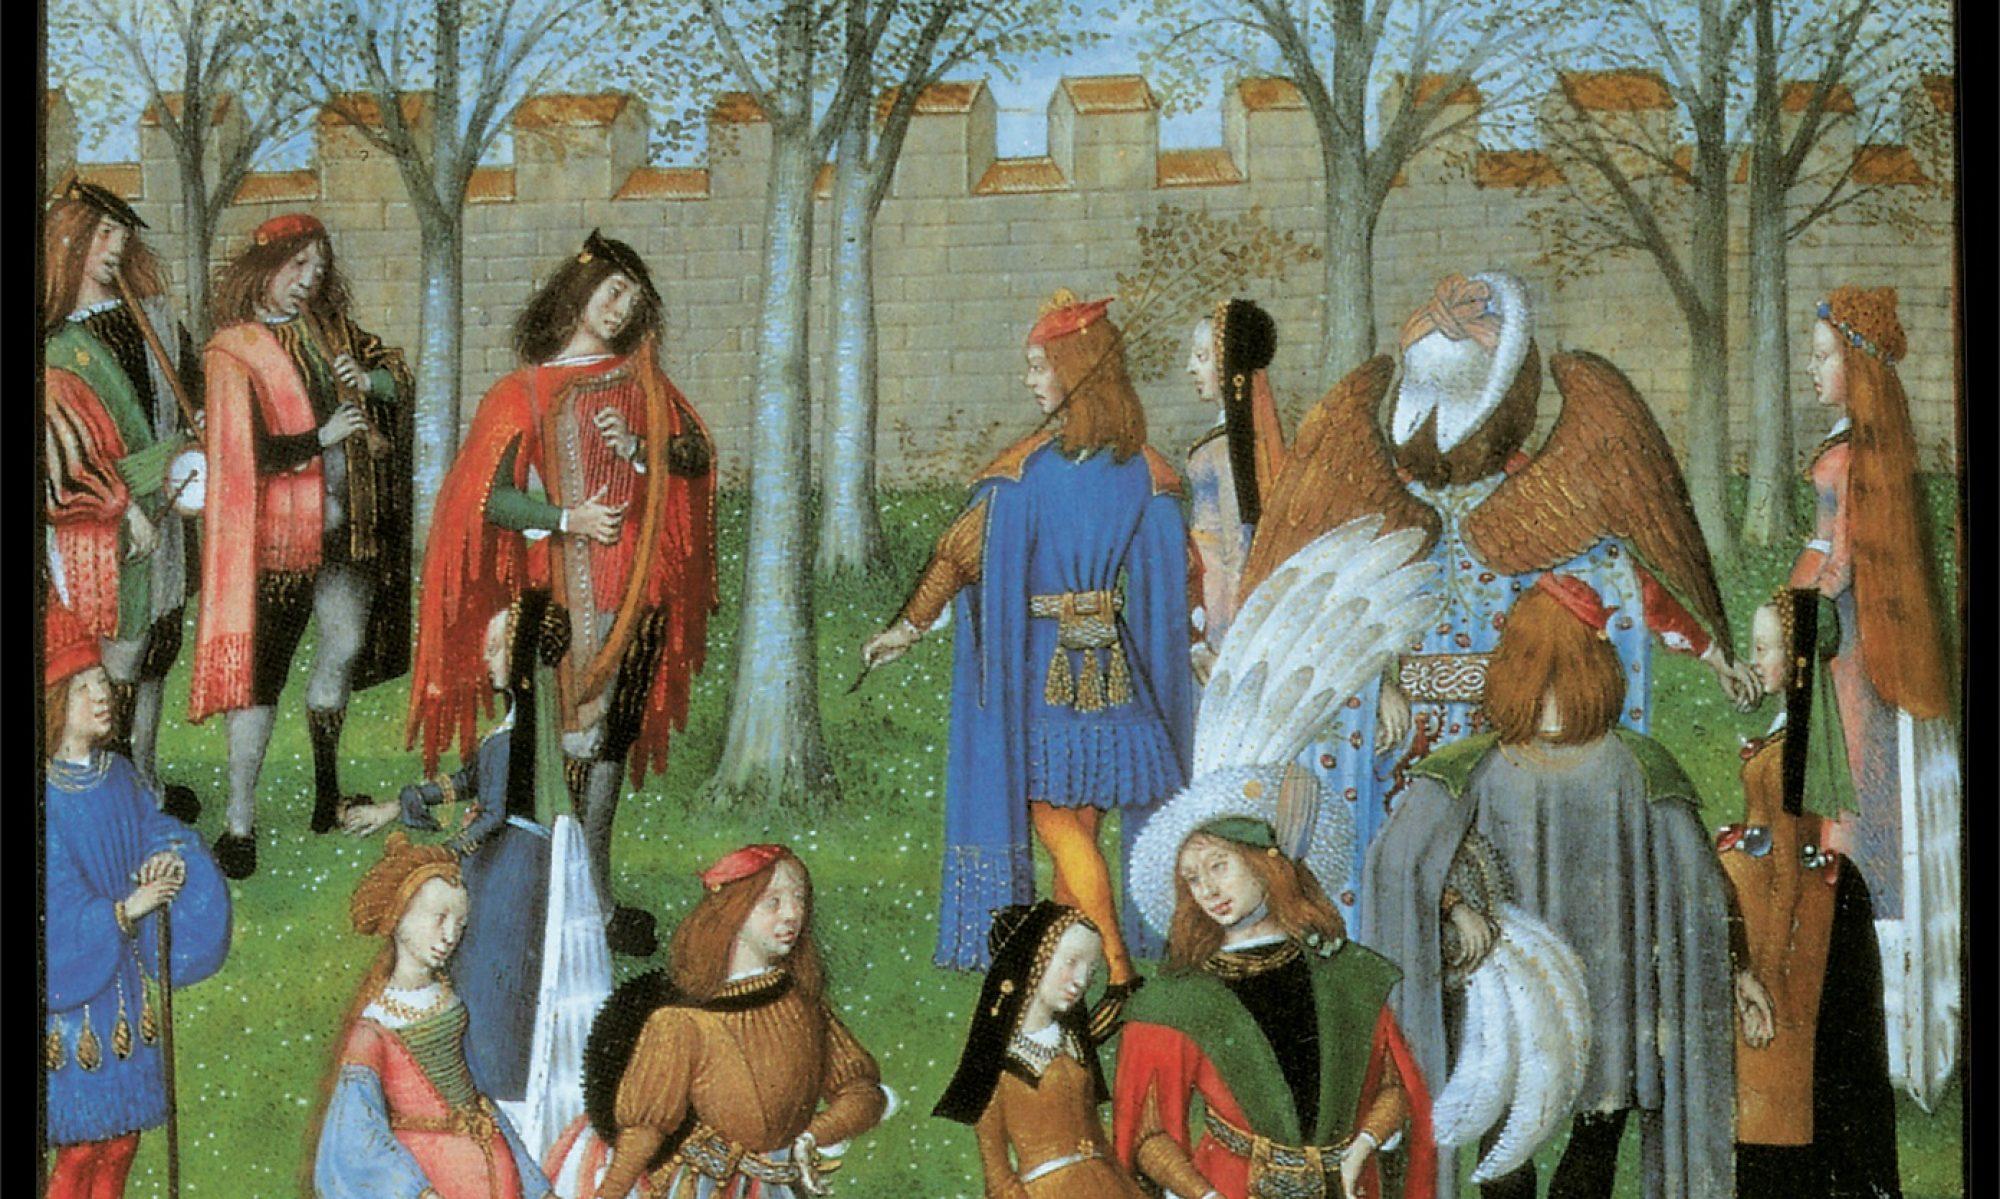 The Barony of Glyn Dwfn